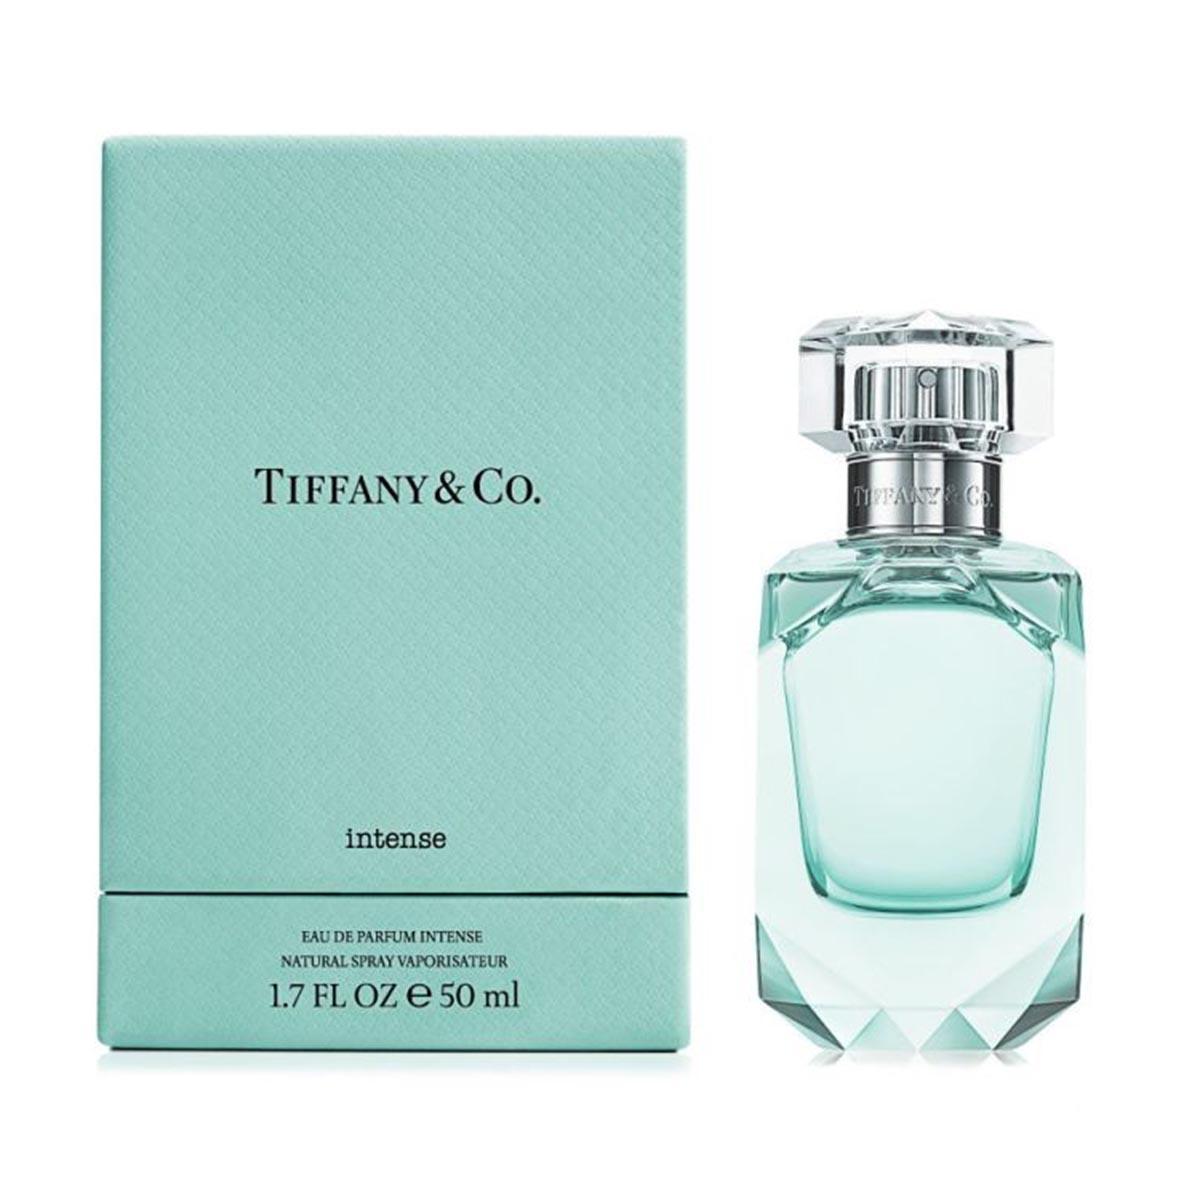 Tiffany co eau de parfum intense 50ml vaporizador